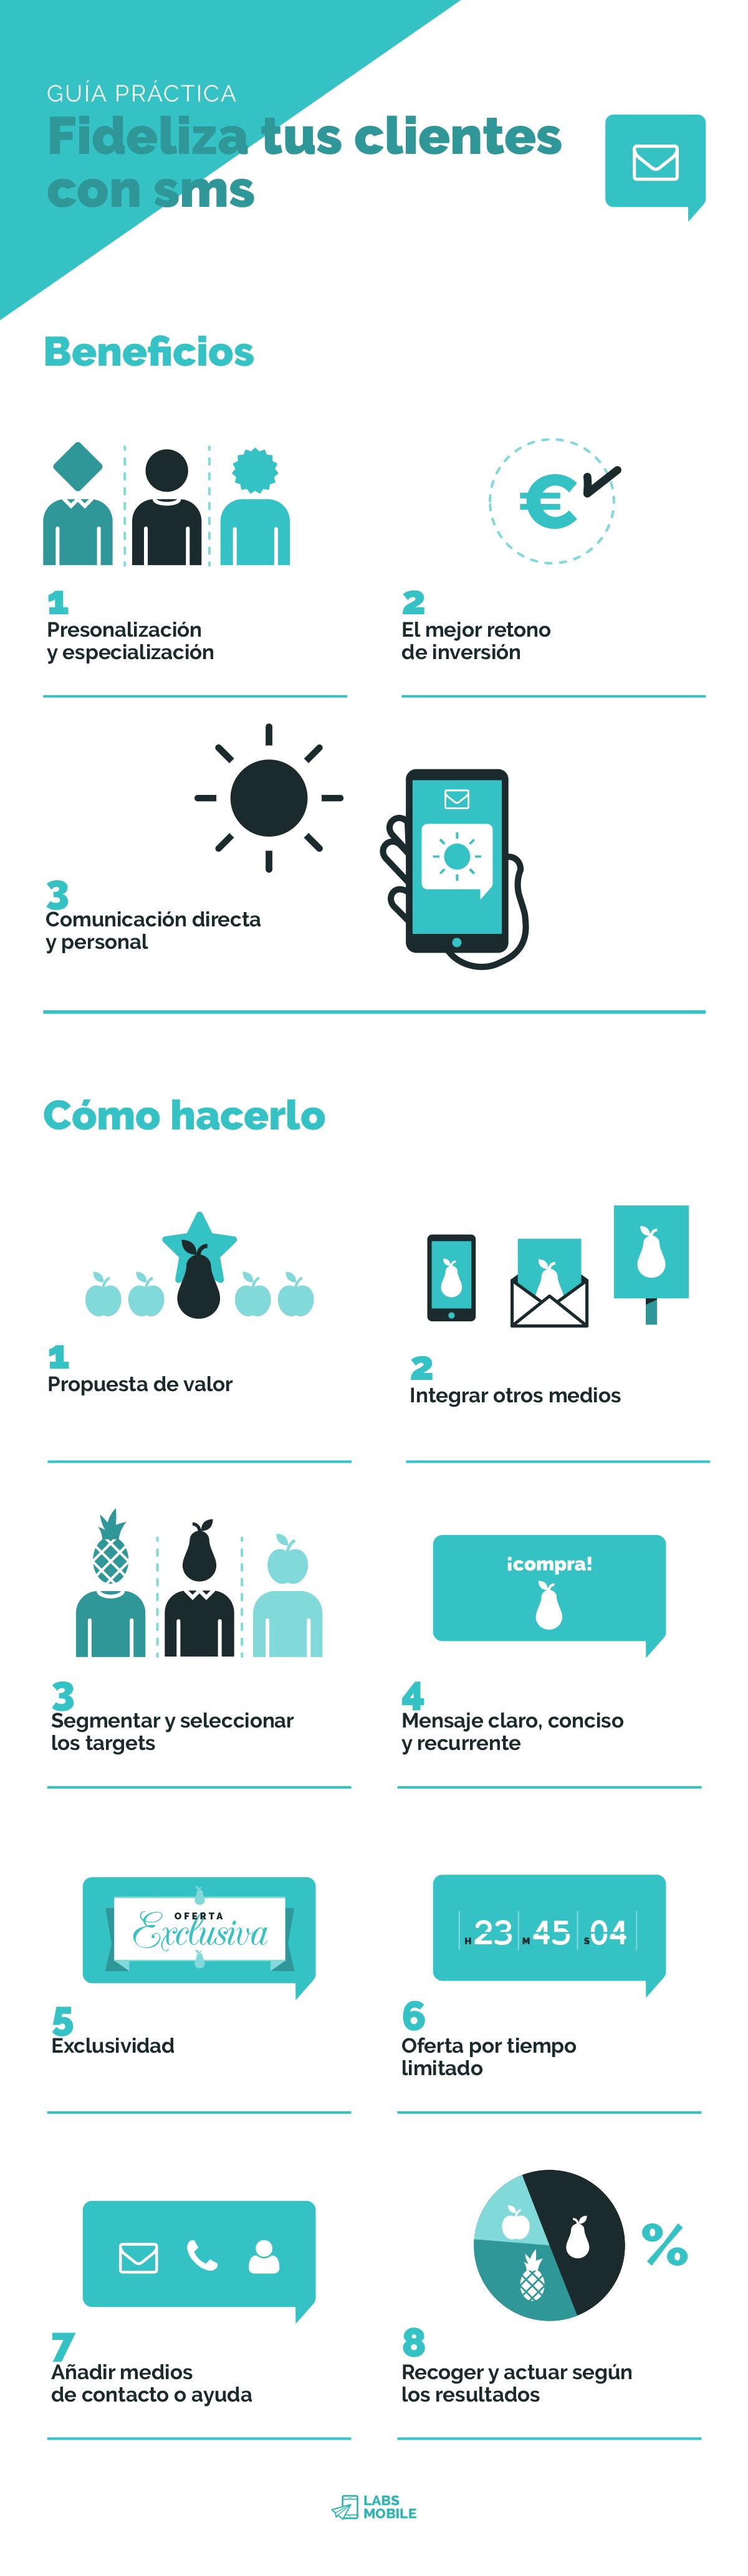 Contenido de los SMS marketing para conservar clientes